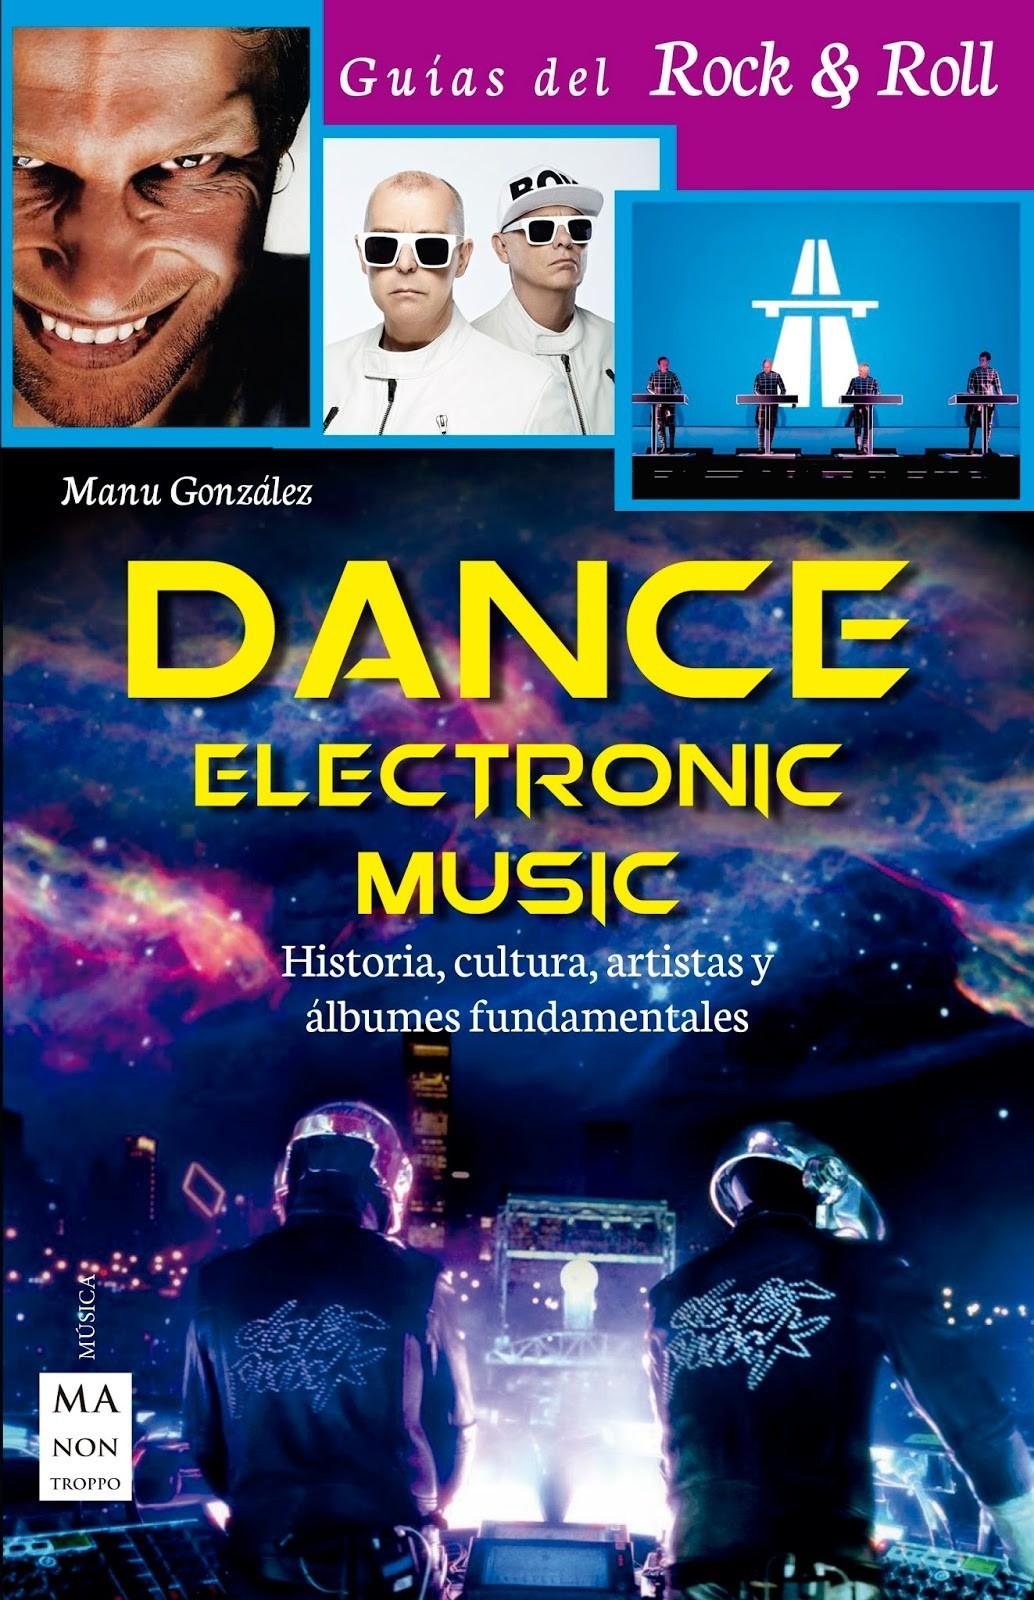 Dance Electronic music 300